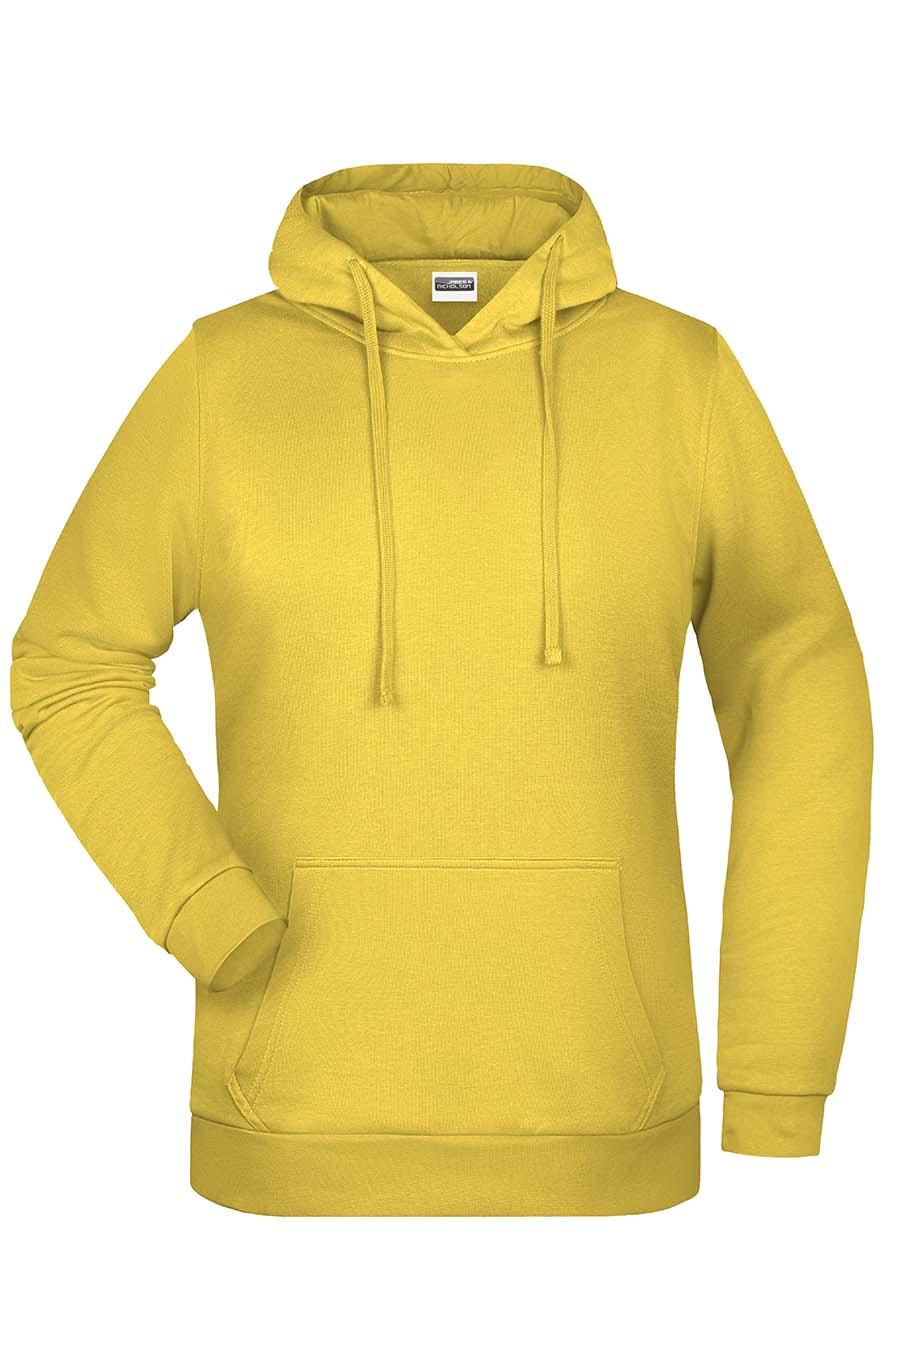 Sweat-shirt capuche femme - 20-1494-23